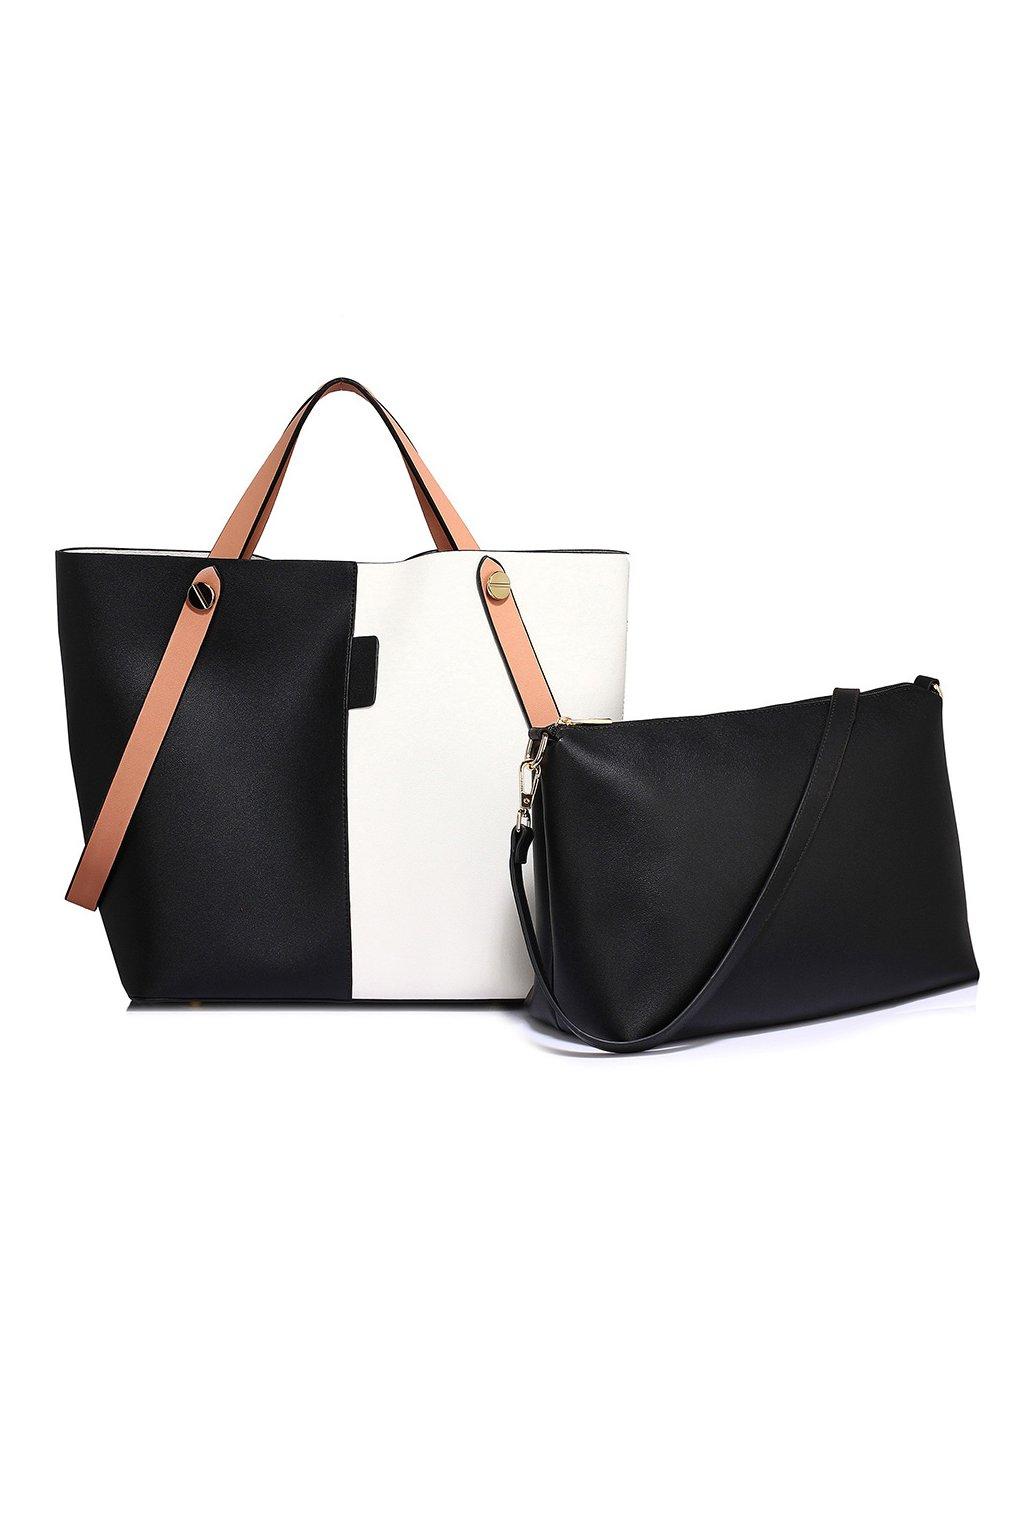 Trendy kabelka Netty bielo / čierna AG00198